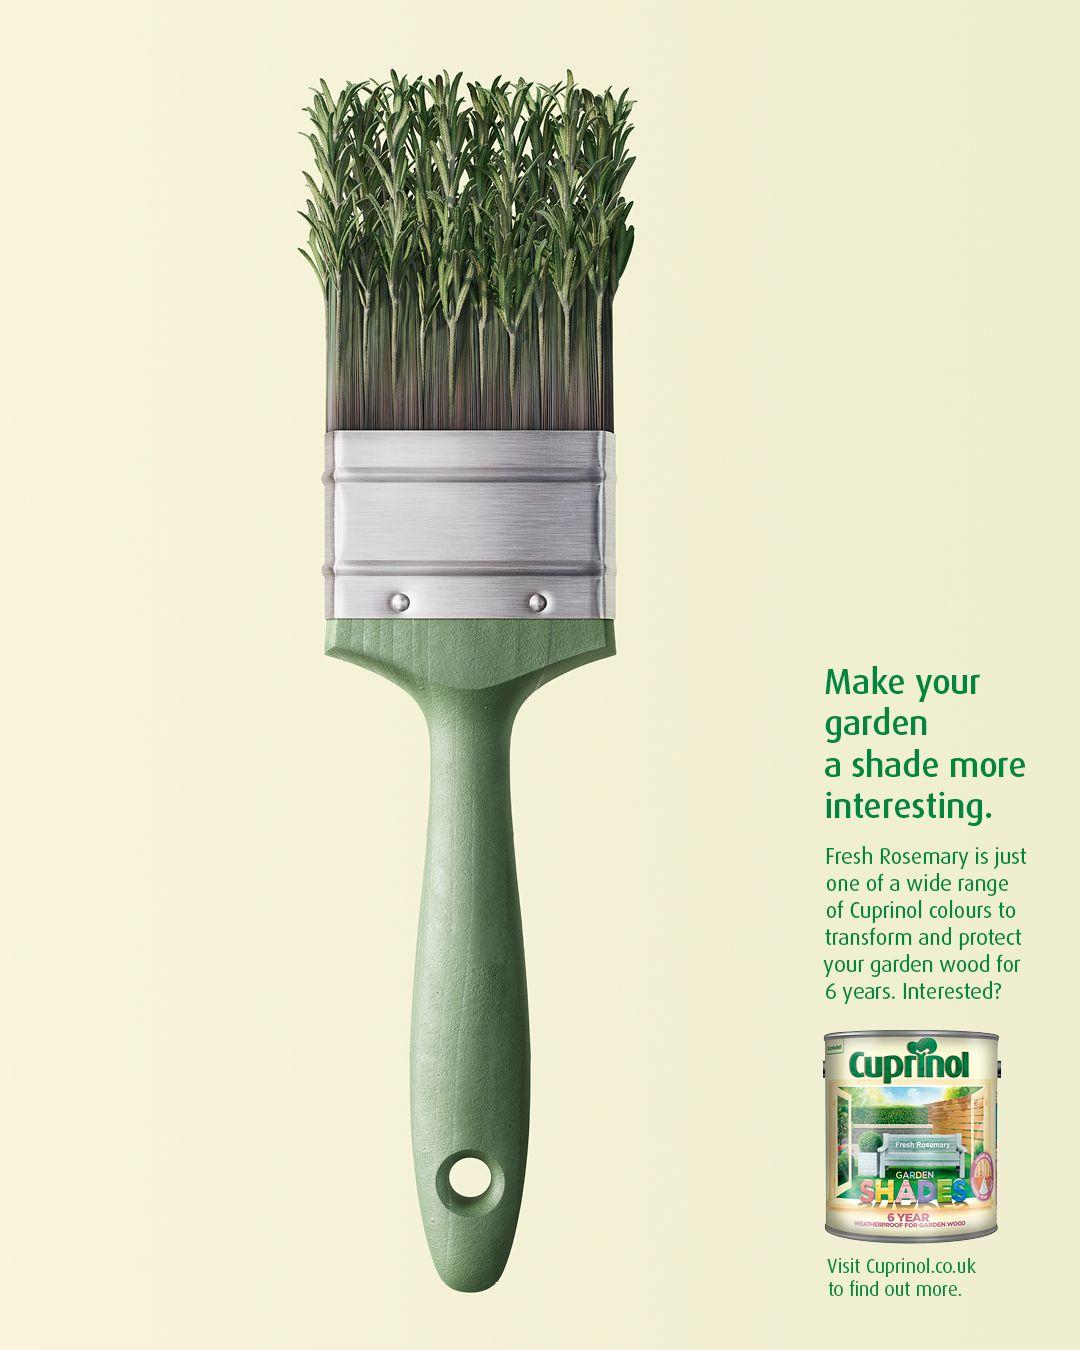 Cuprinol Adgoodness Design Print Layout Graphic Design Advertising Ads Creative